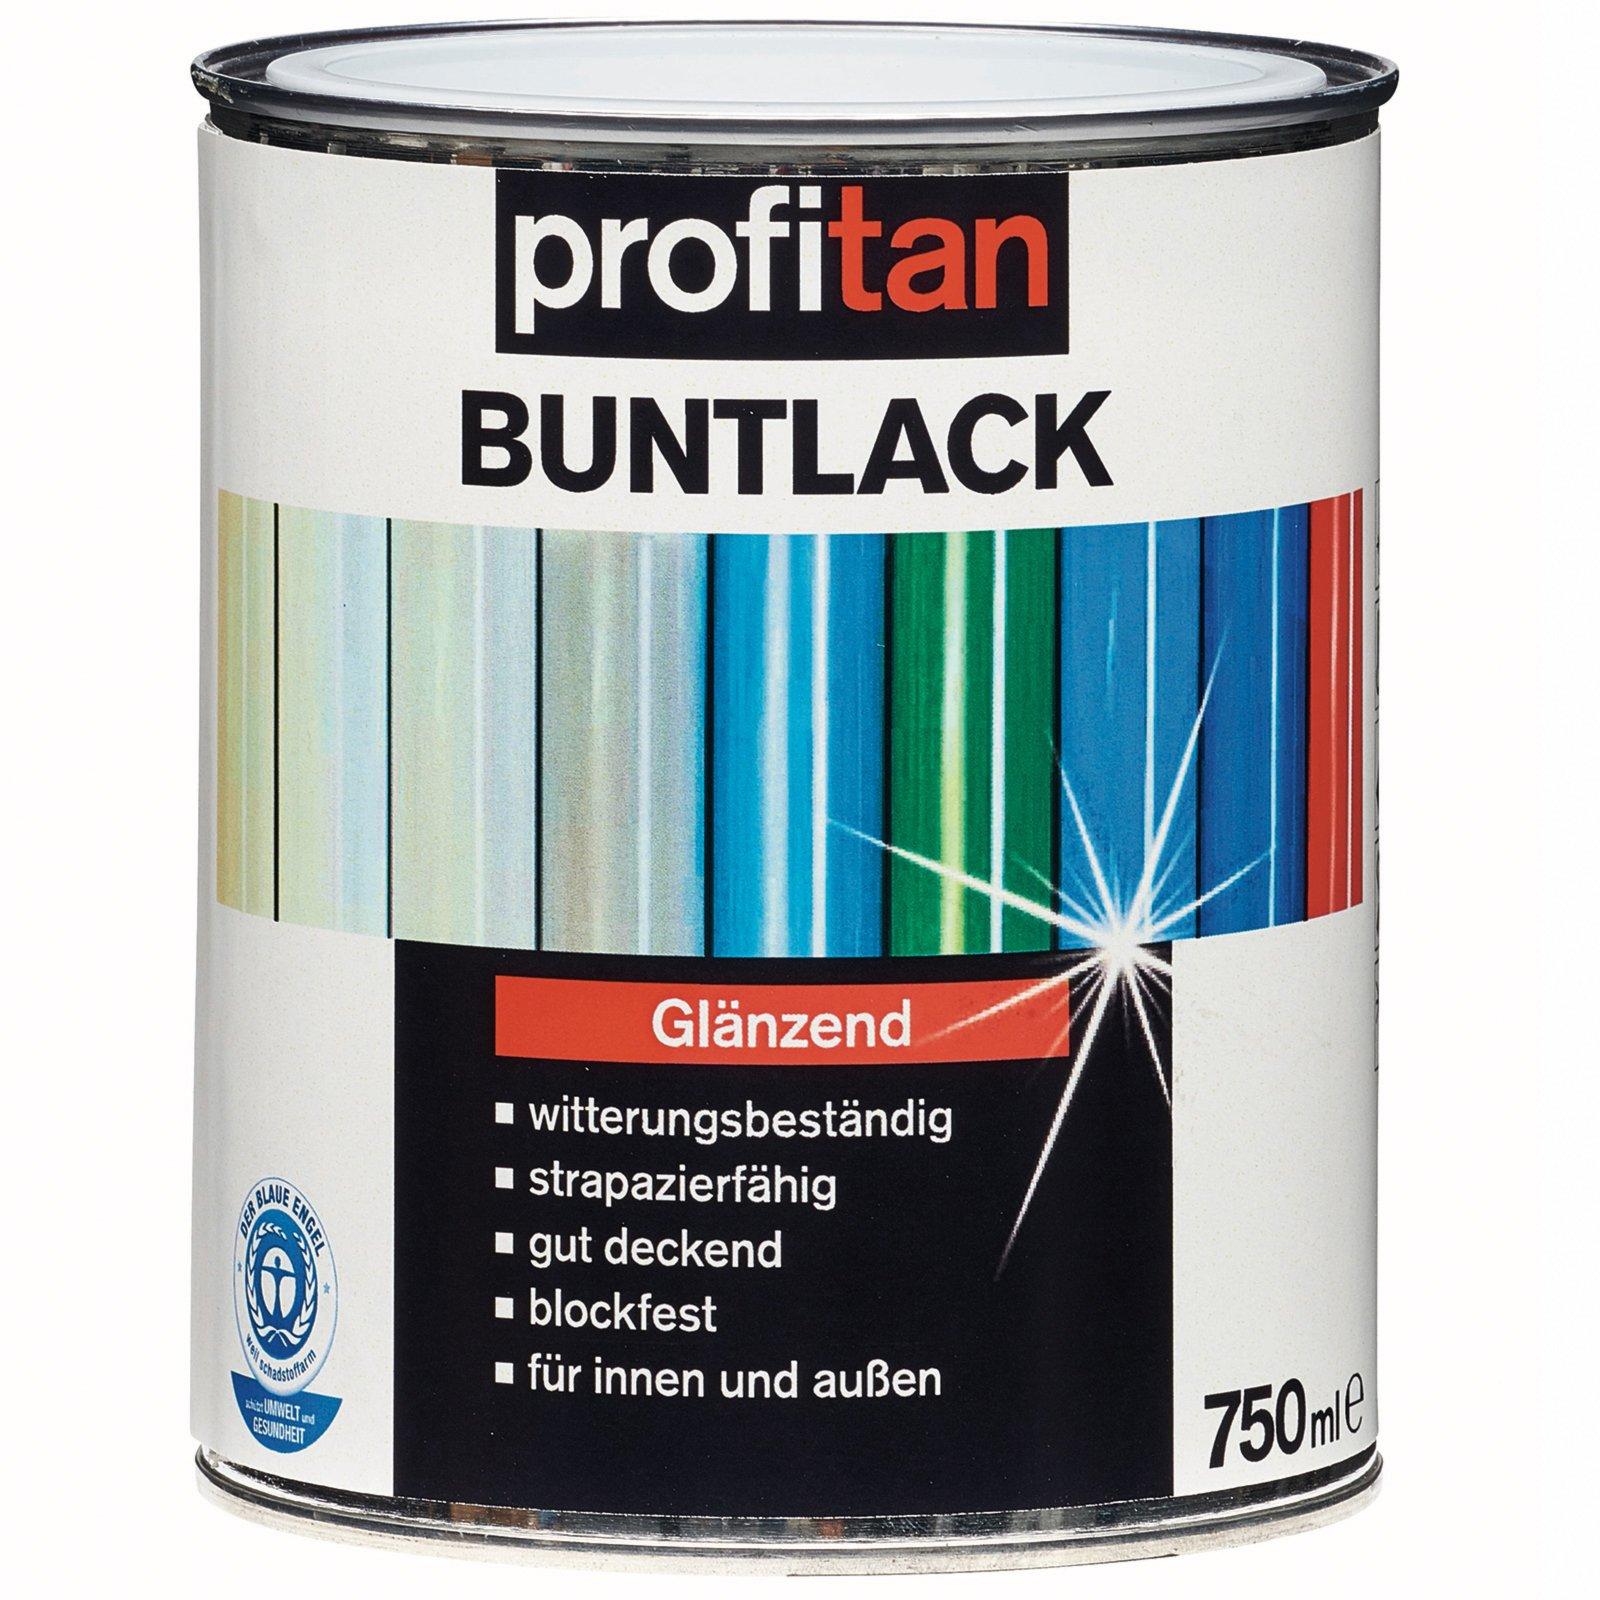 profitan Buntlack - reinweiß glänzend - 750 ml